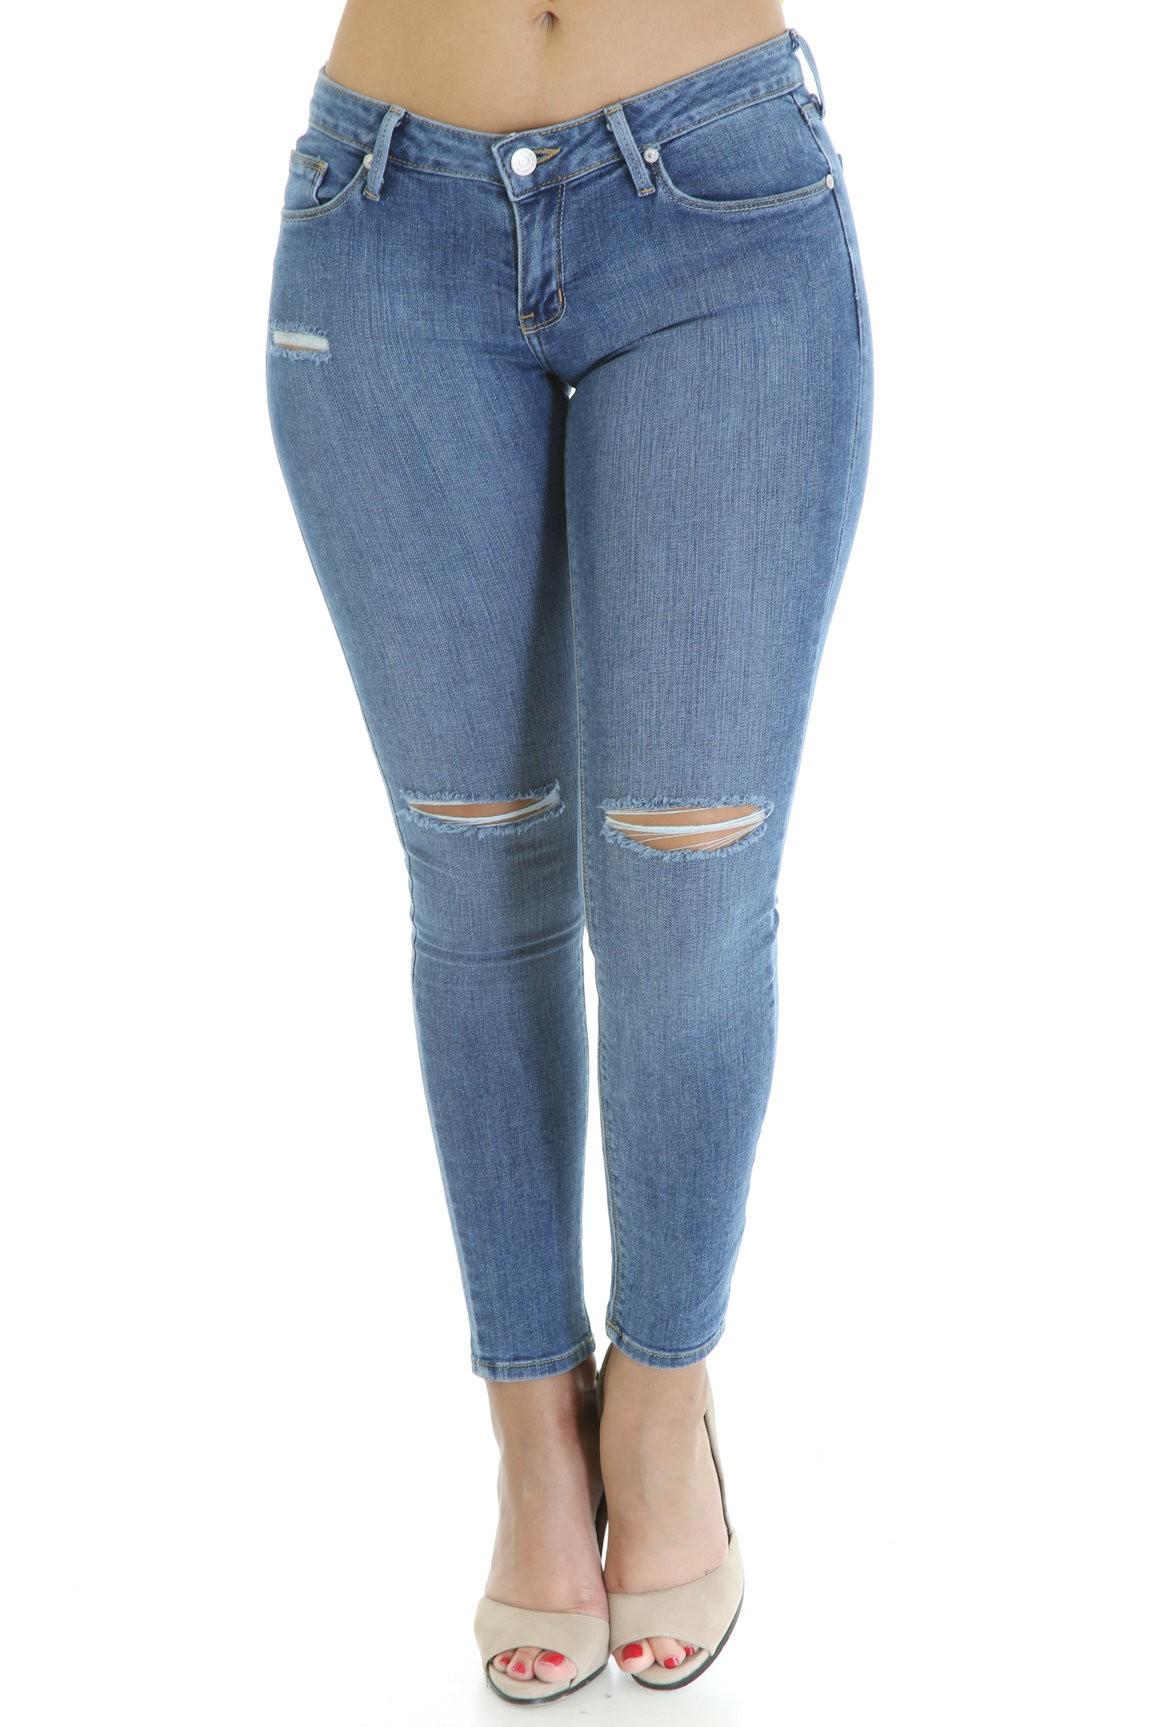 Knee Self Distress Jeans